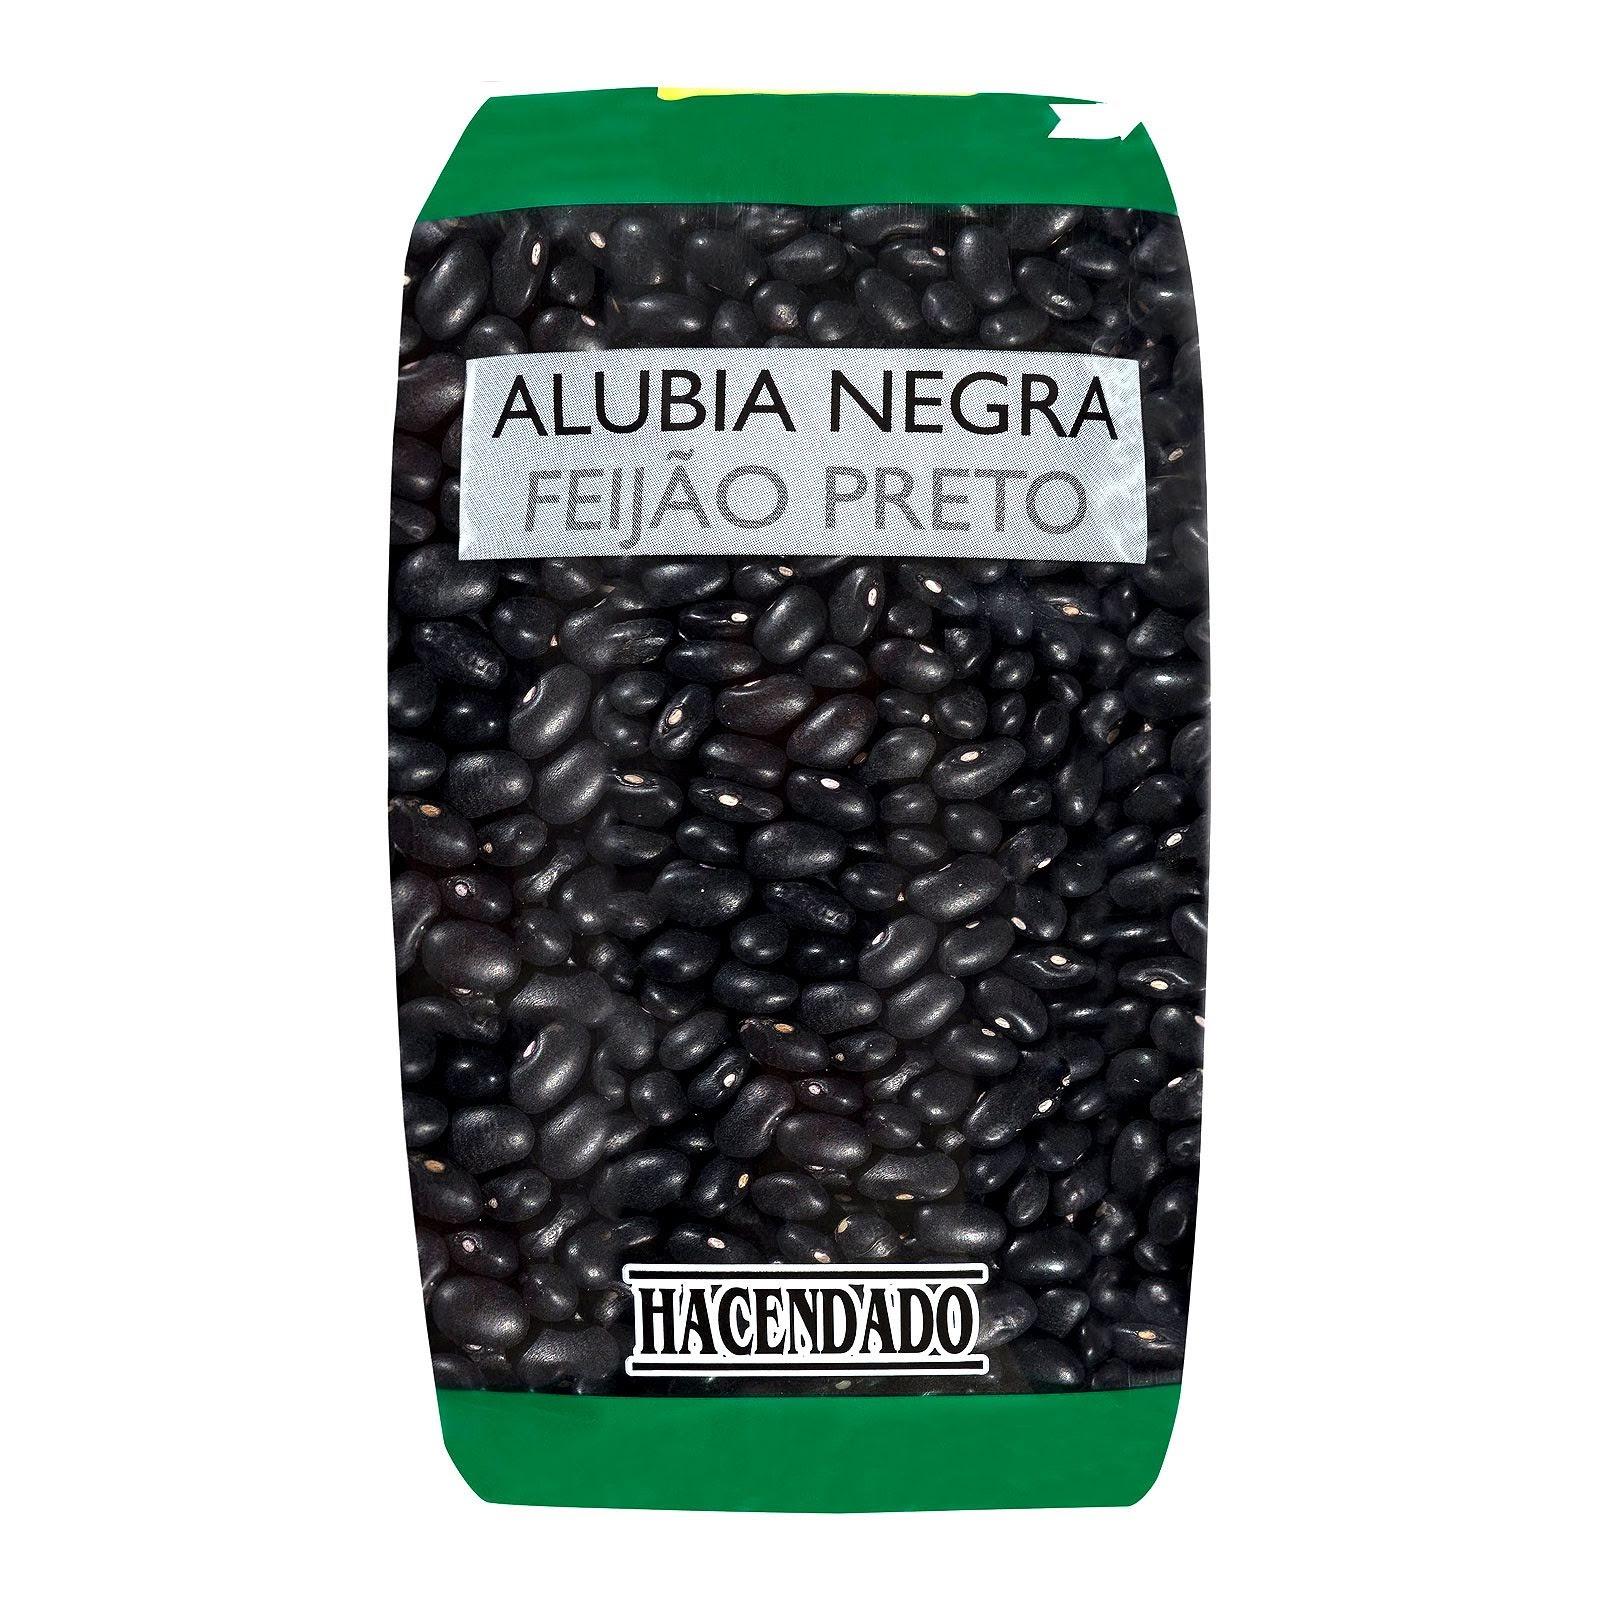 Alubia seca negra Hacendado